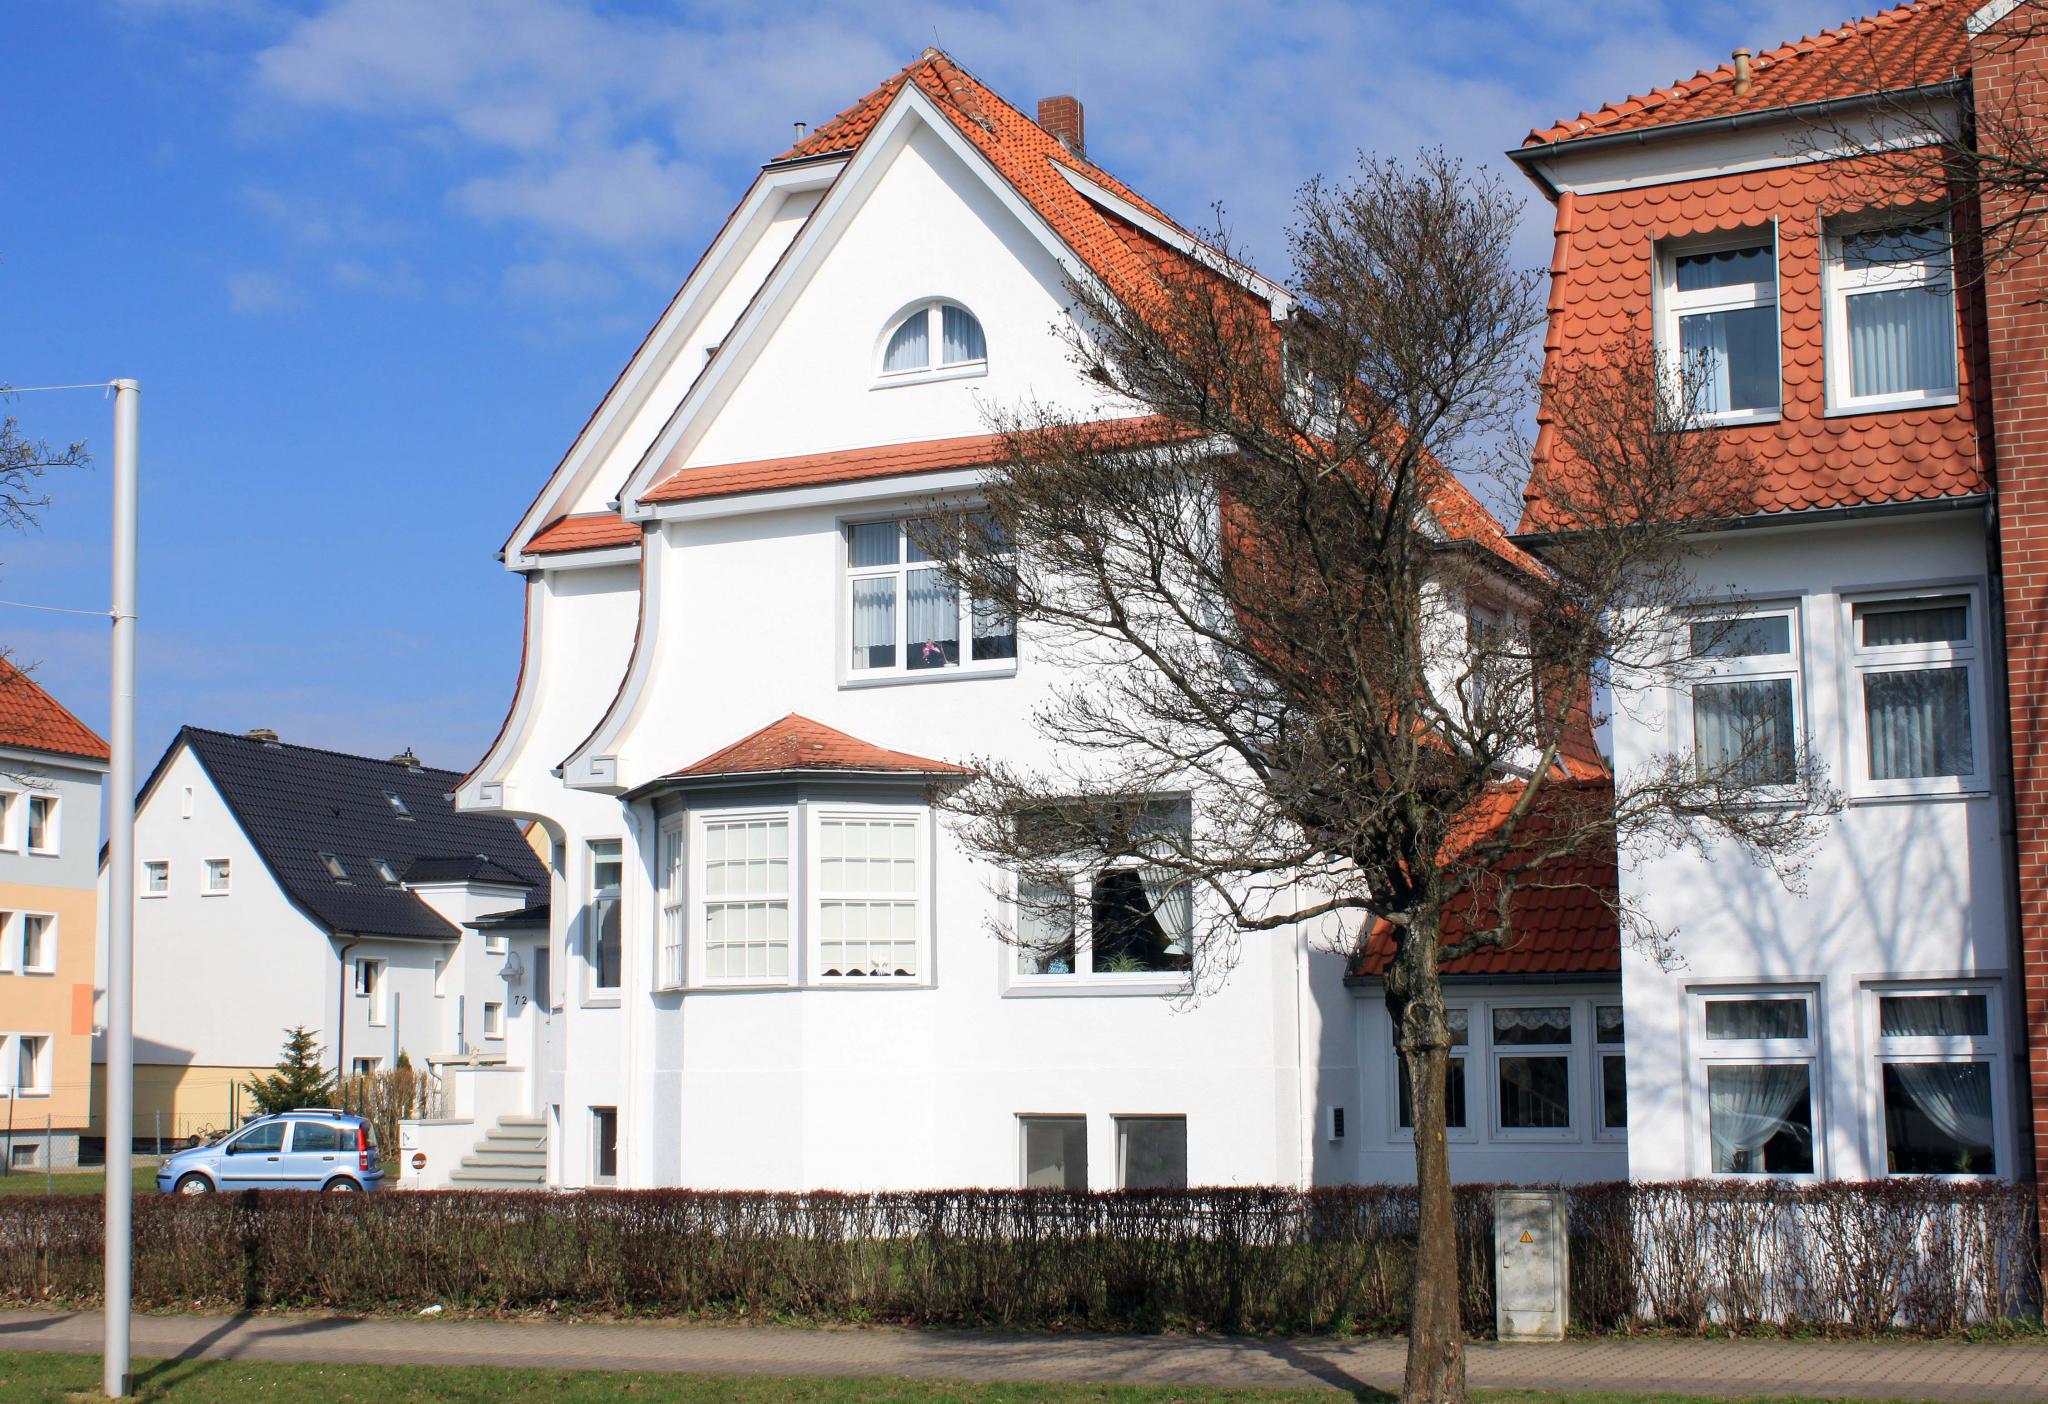 HildesheimerStr2011er-03-VillaAmtsgerichtsratCaspar_späterSommer